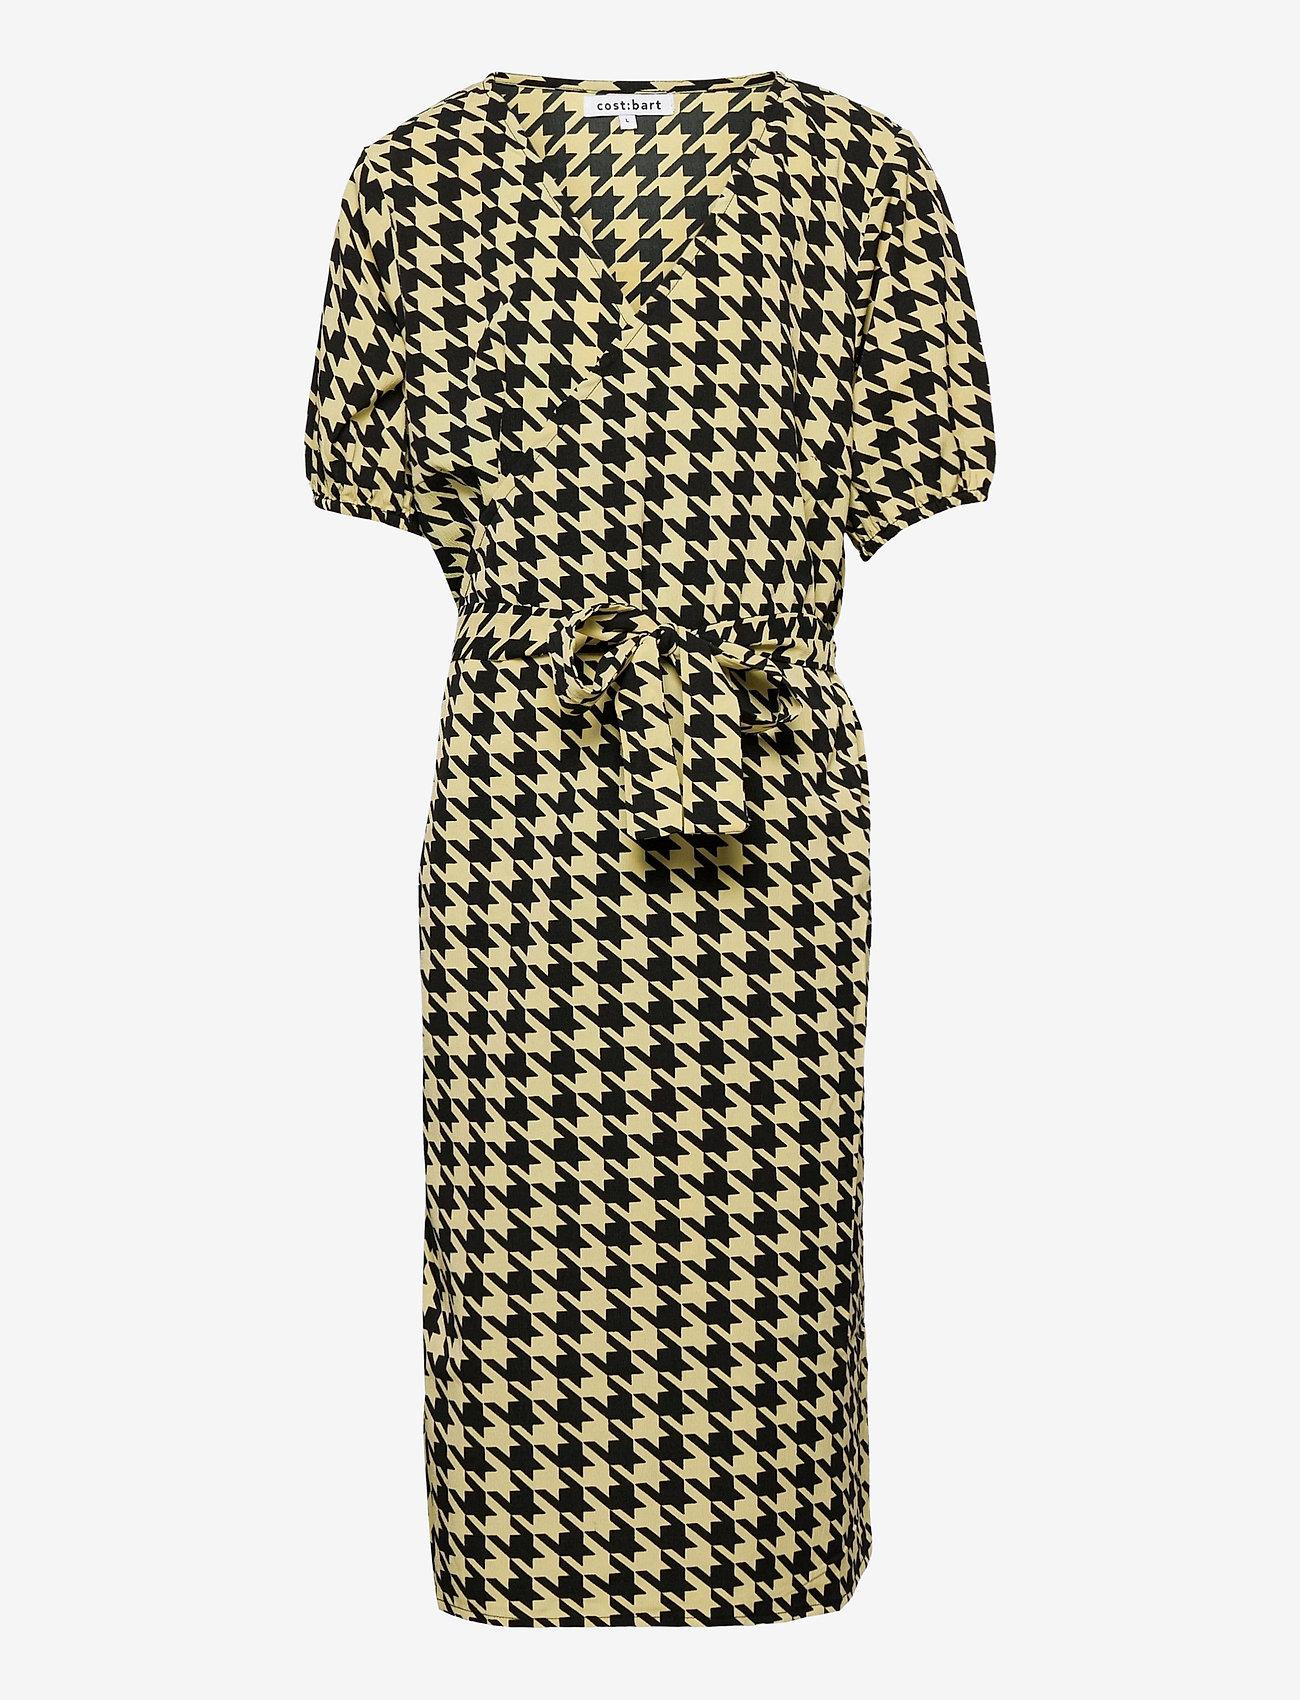 Costbart - NALA SS WRAP DRESS - kleider - pale banana - 0